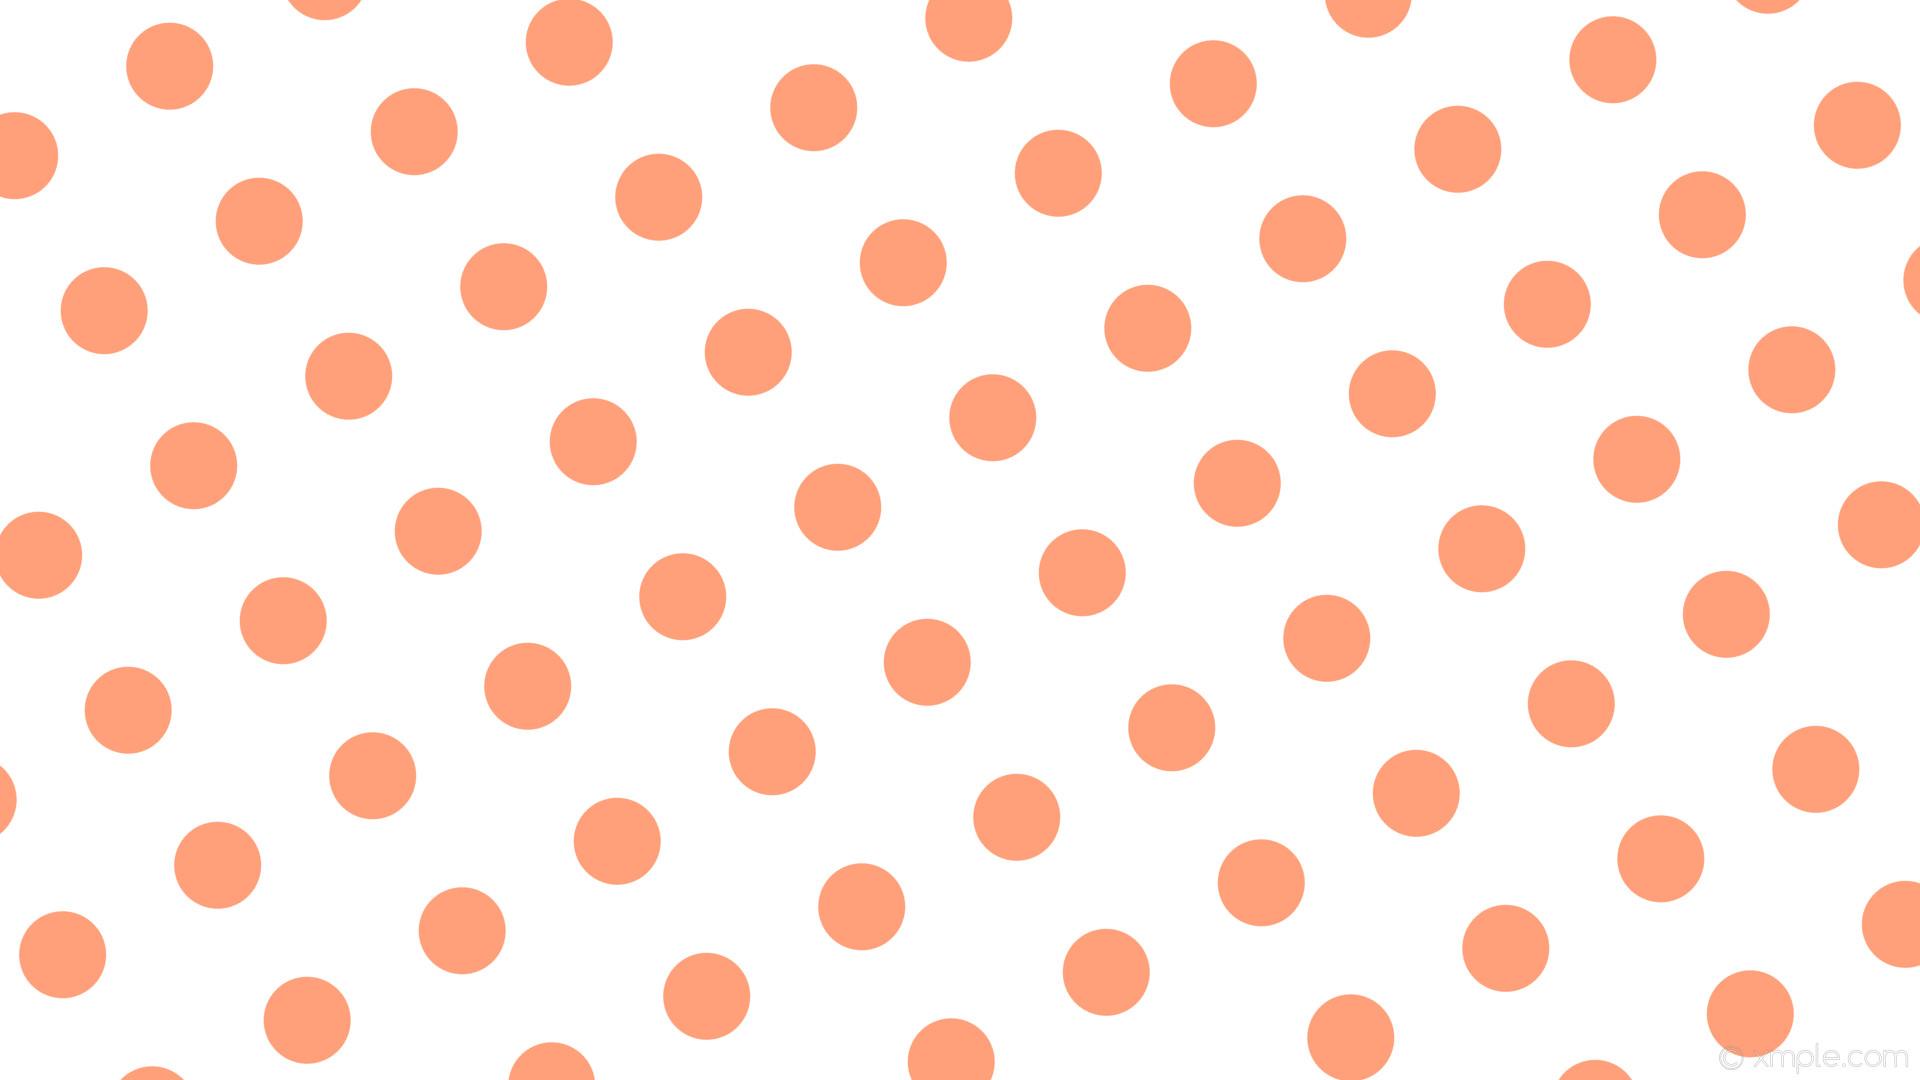 wallpaper white polka dots red spots light salmon #ffffff #ffa07a 210° 87px  179px